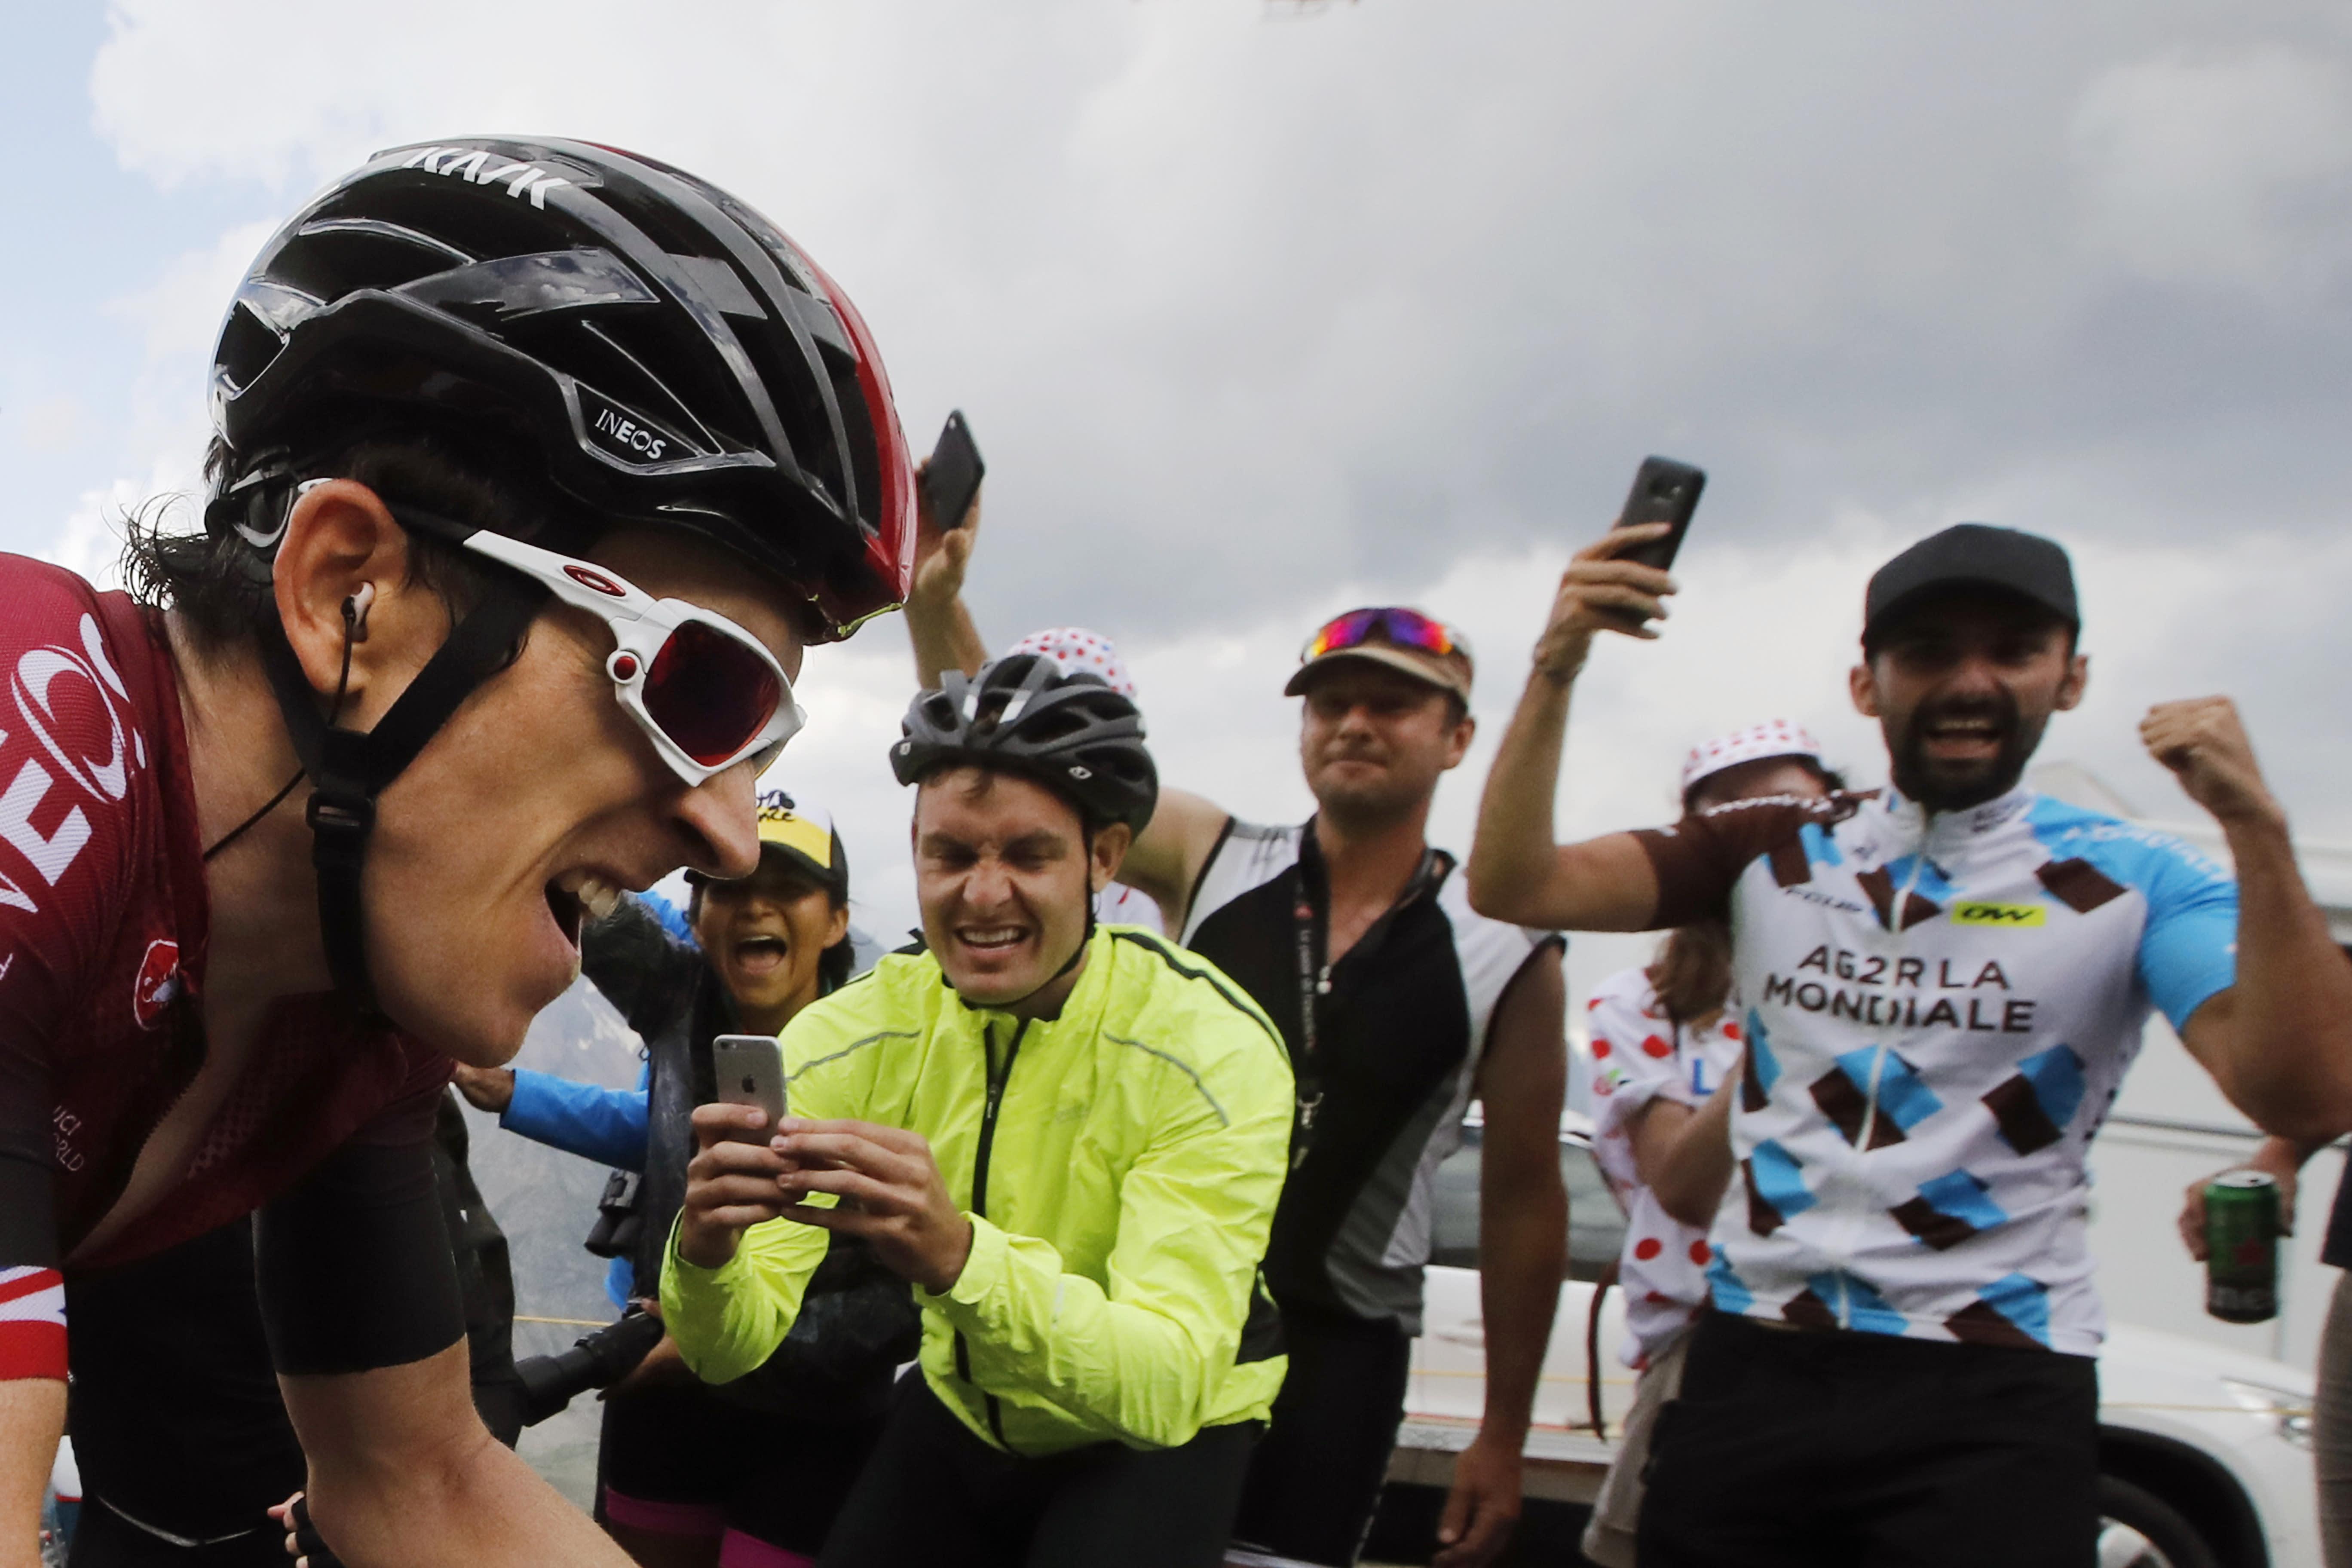 Tour de France: Fan holding sign causes huge crash - CNN